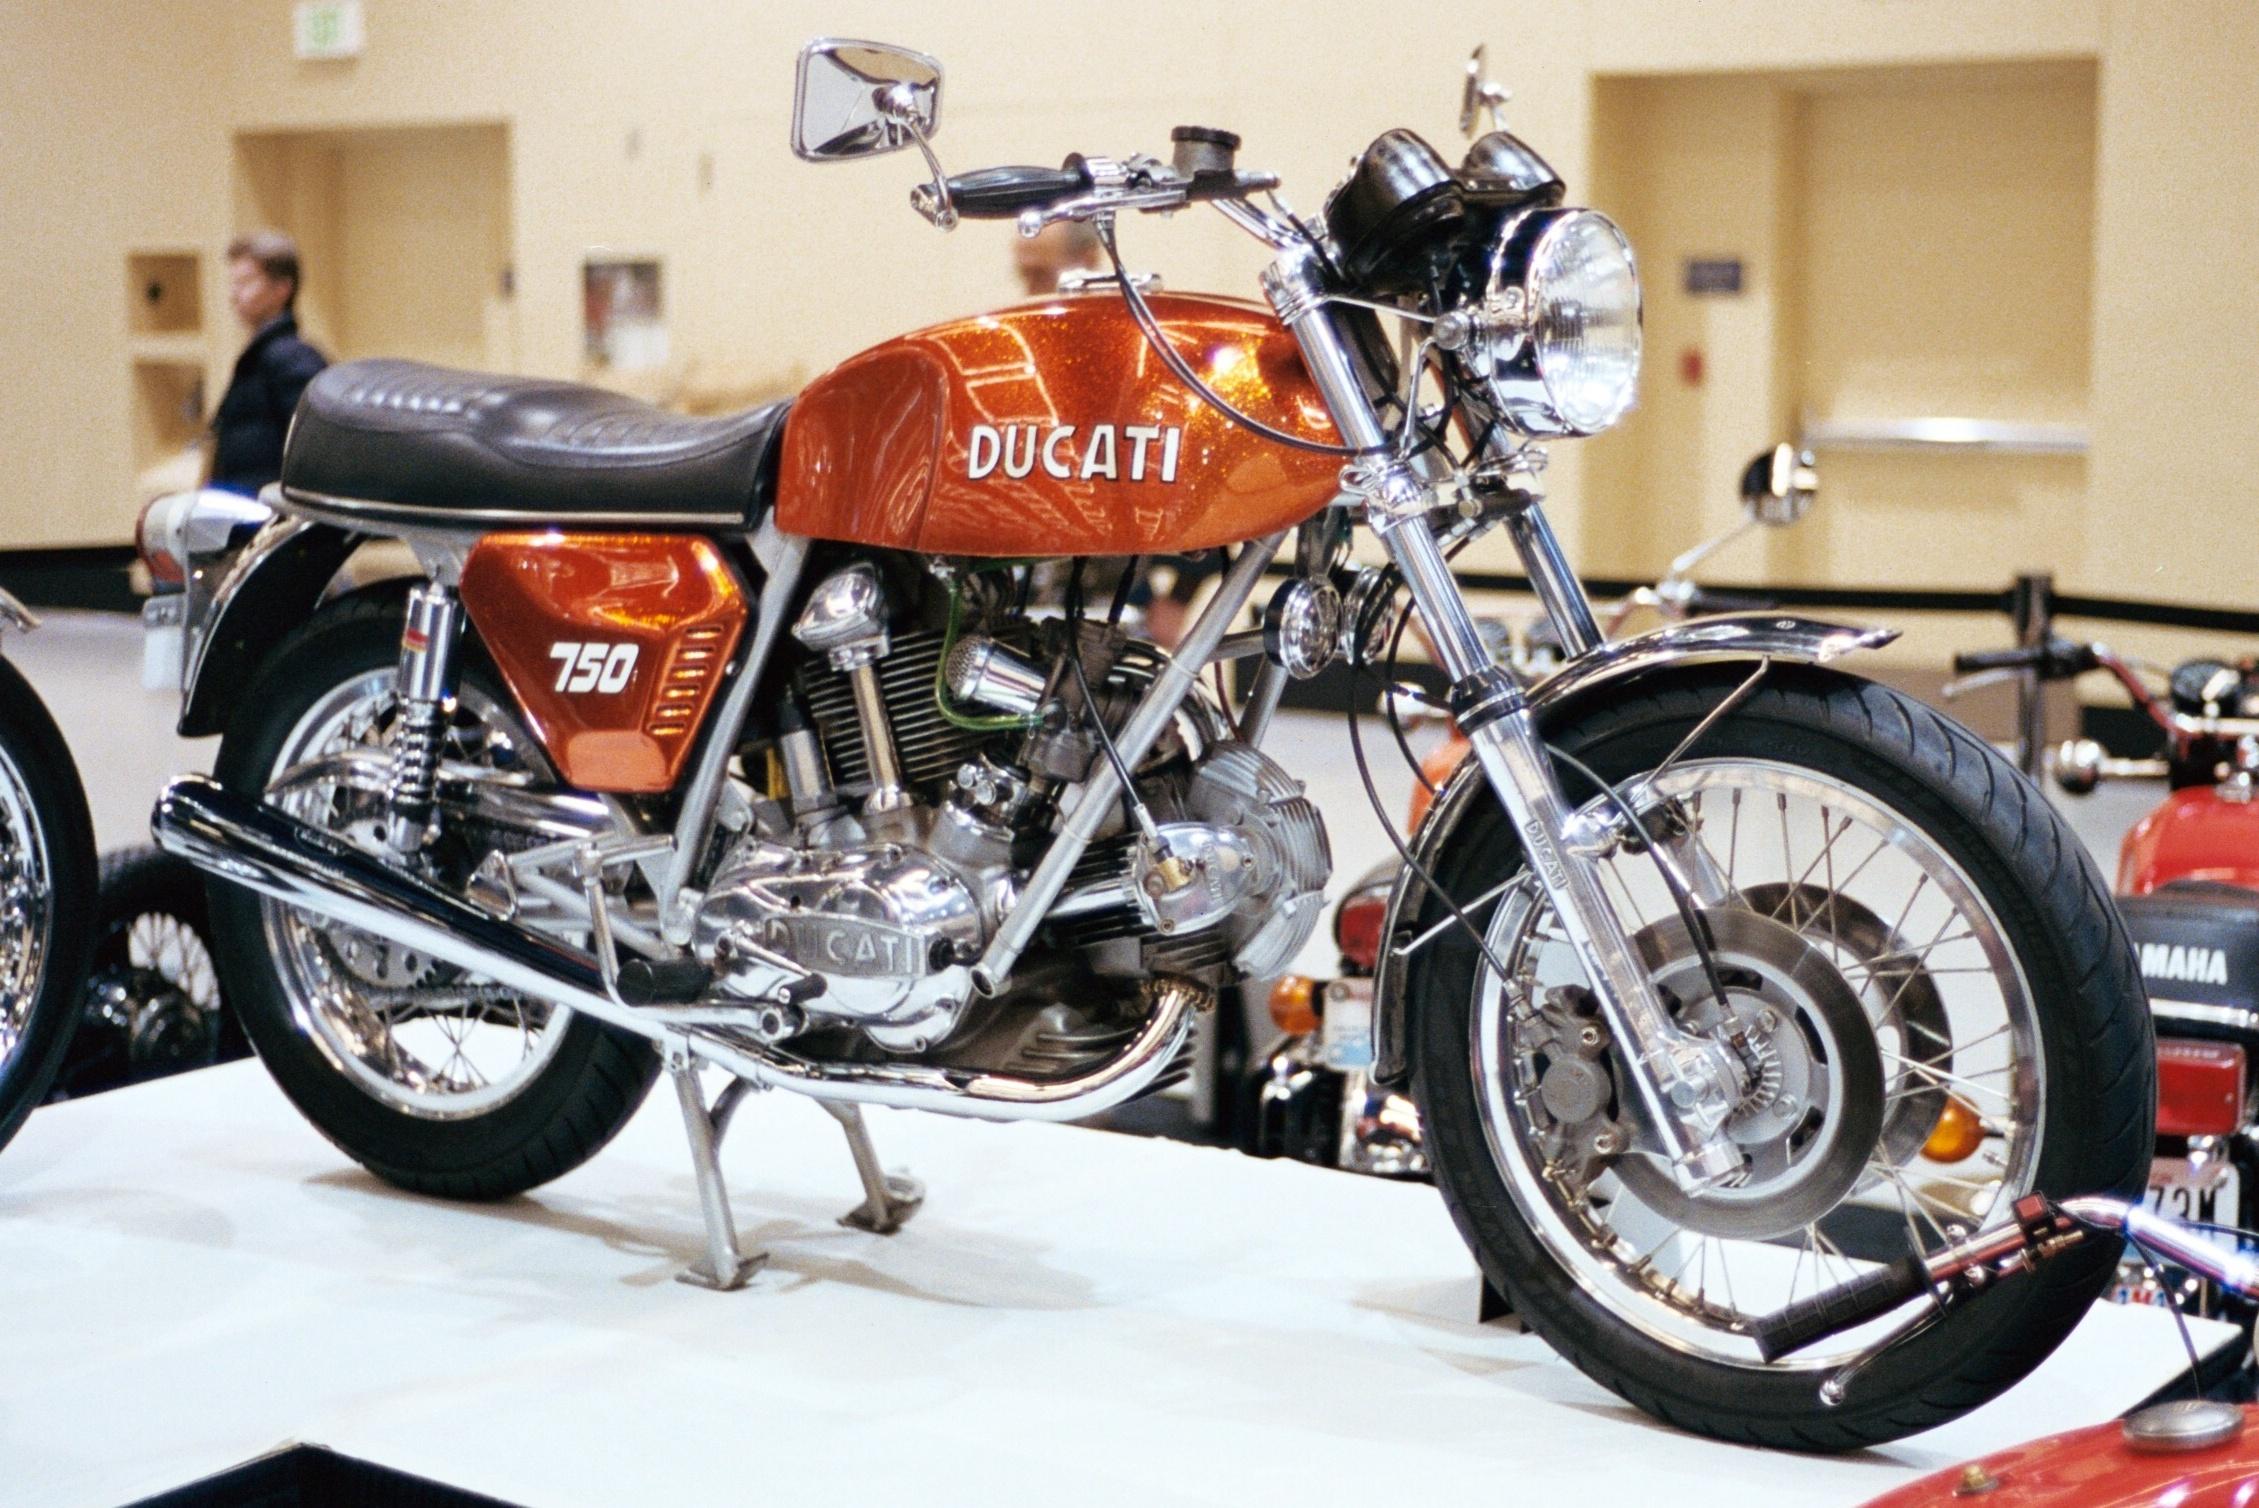 Ducati Scrambler For Sale Ebay